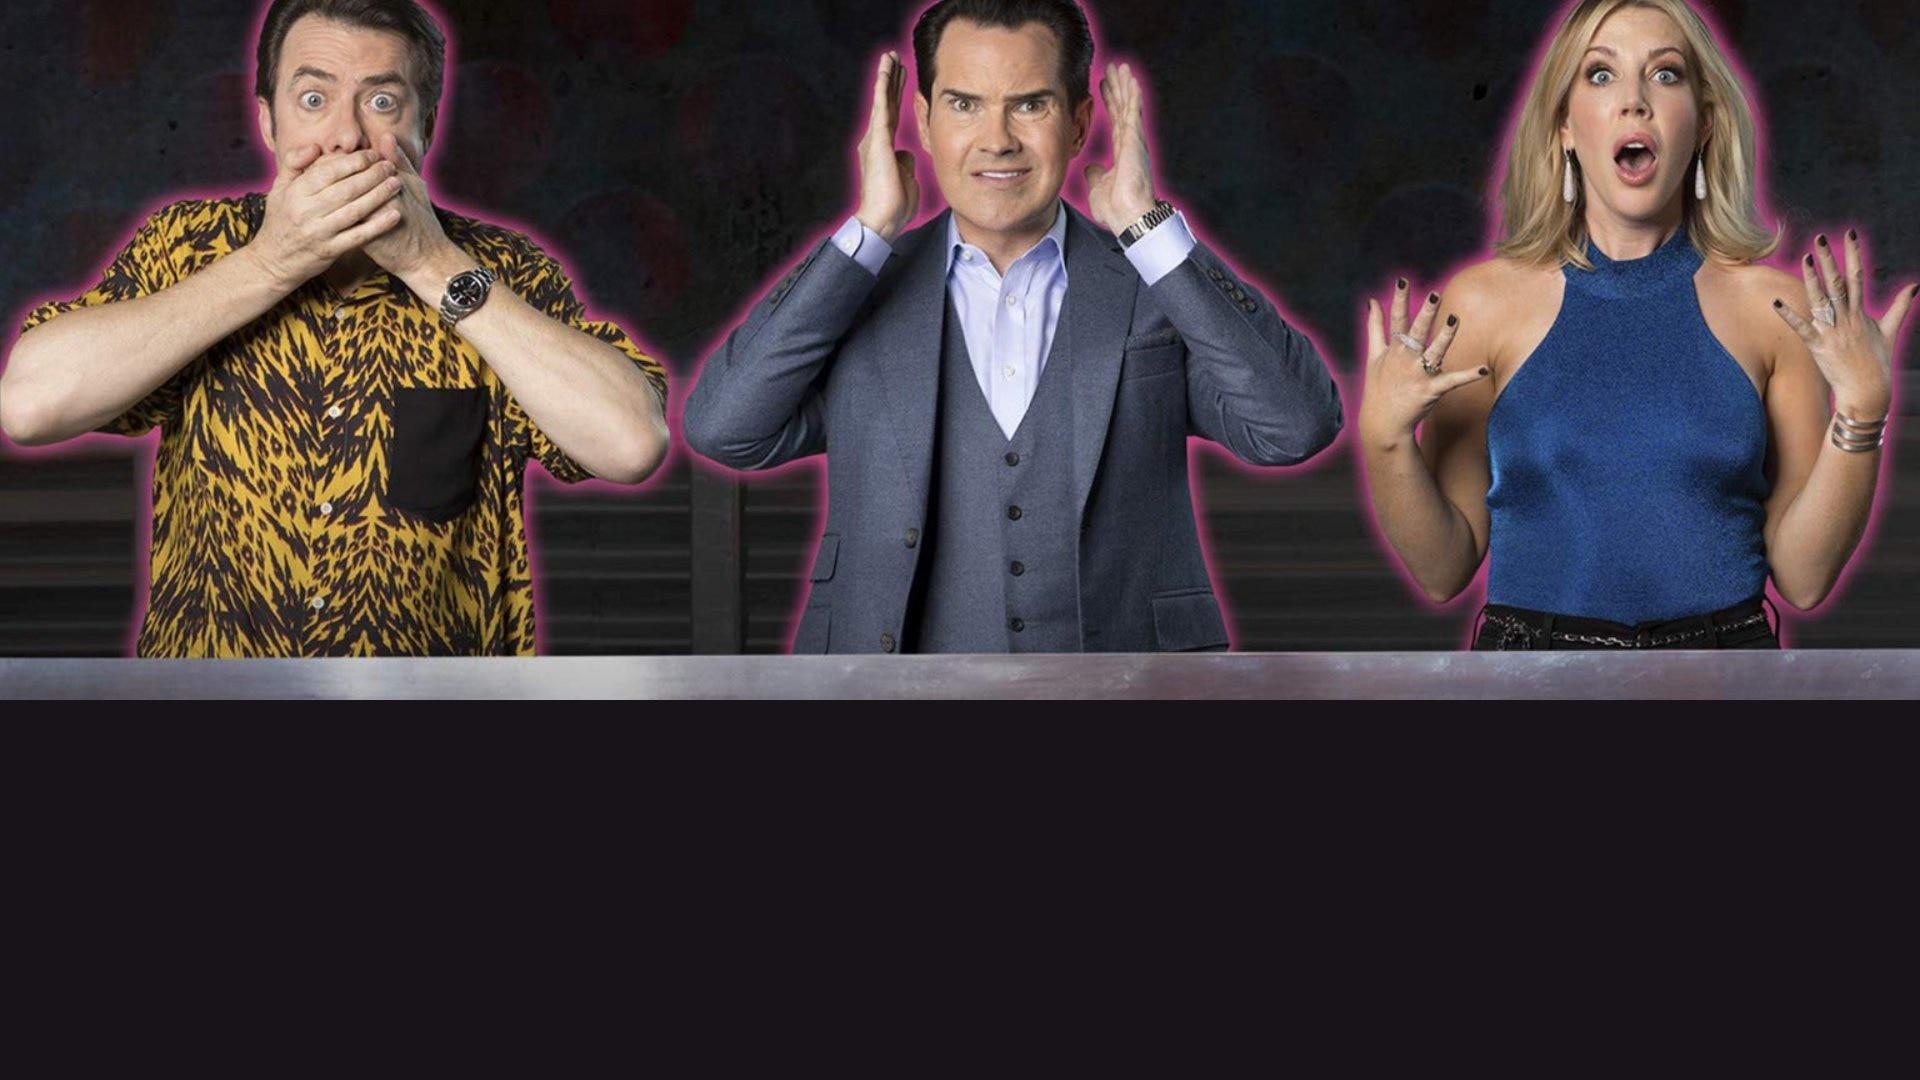 Comedy Central Roast Battle UK